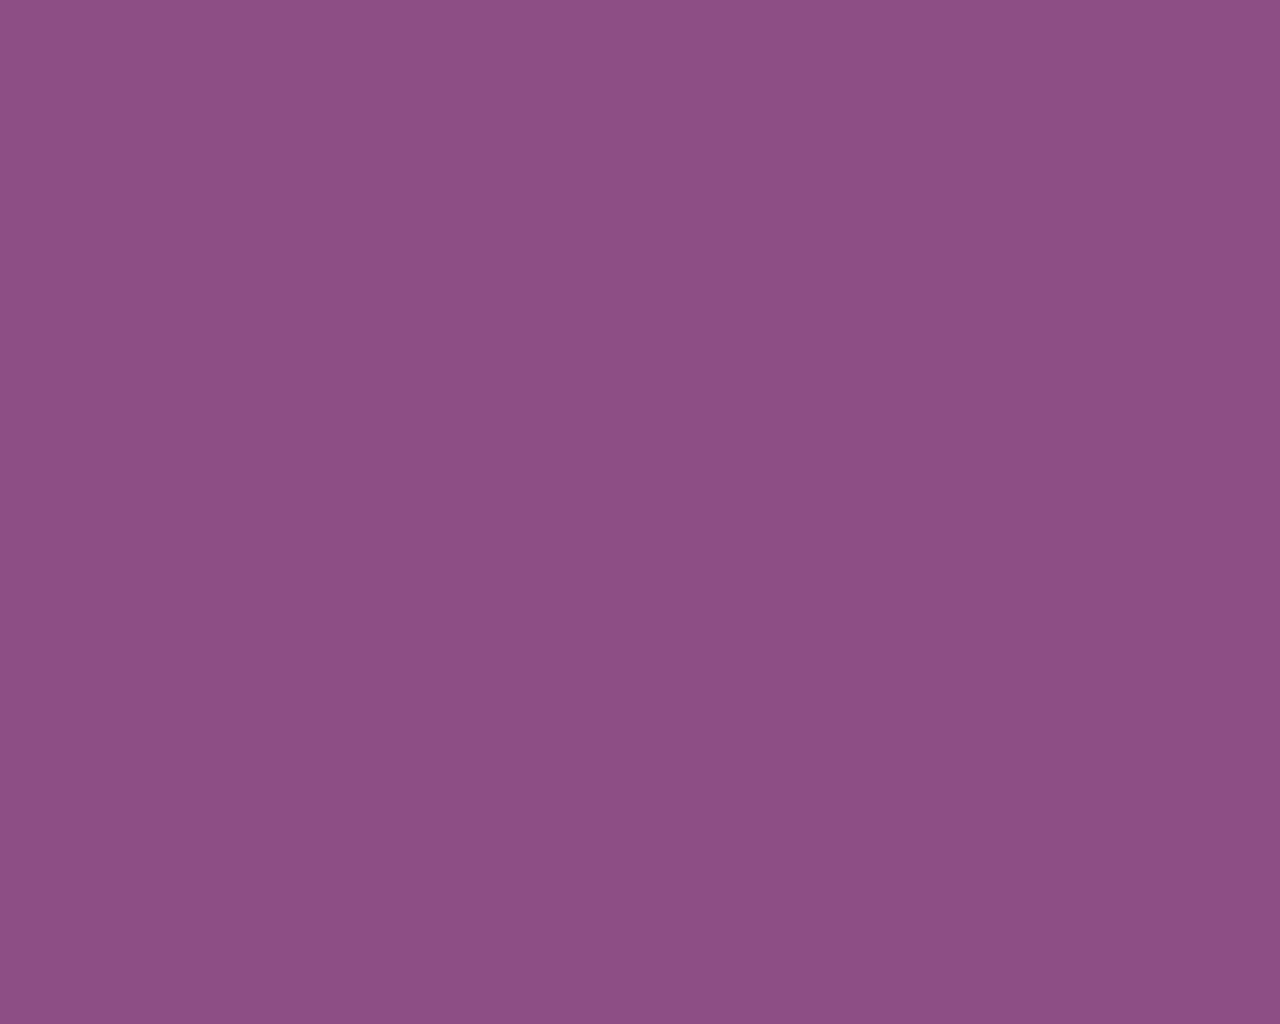 1280x1024 Razzmic Berry Solid Color Background